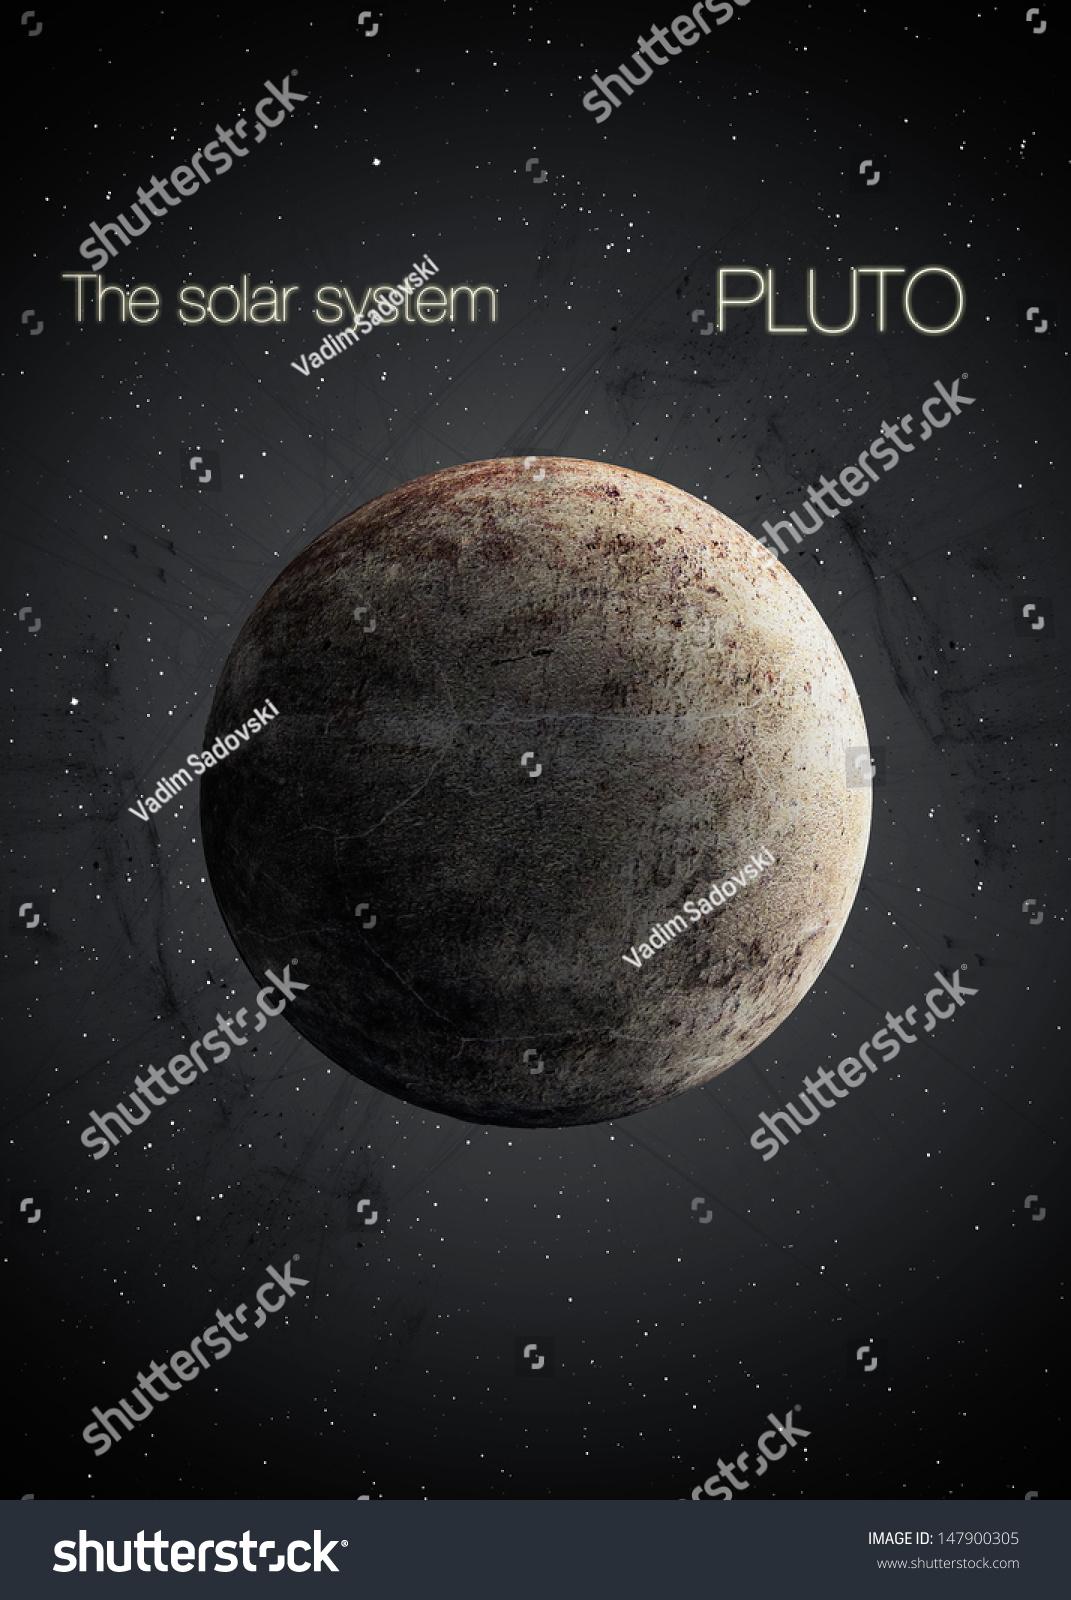 elements present on planet pluto - photo #1